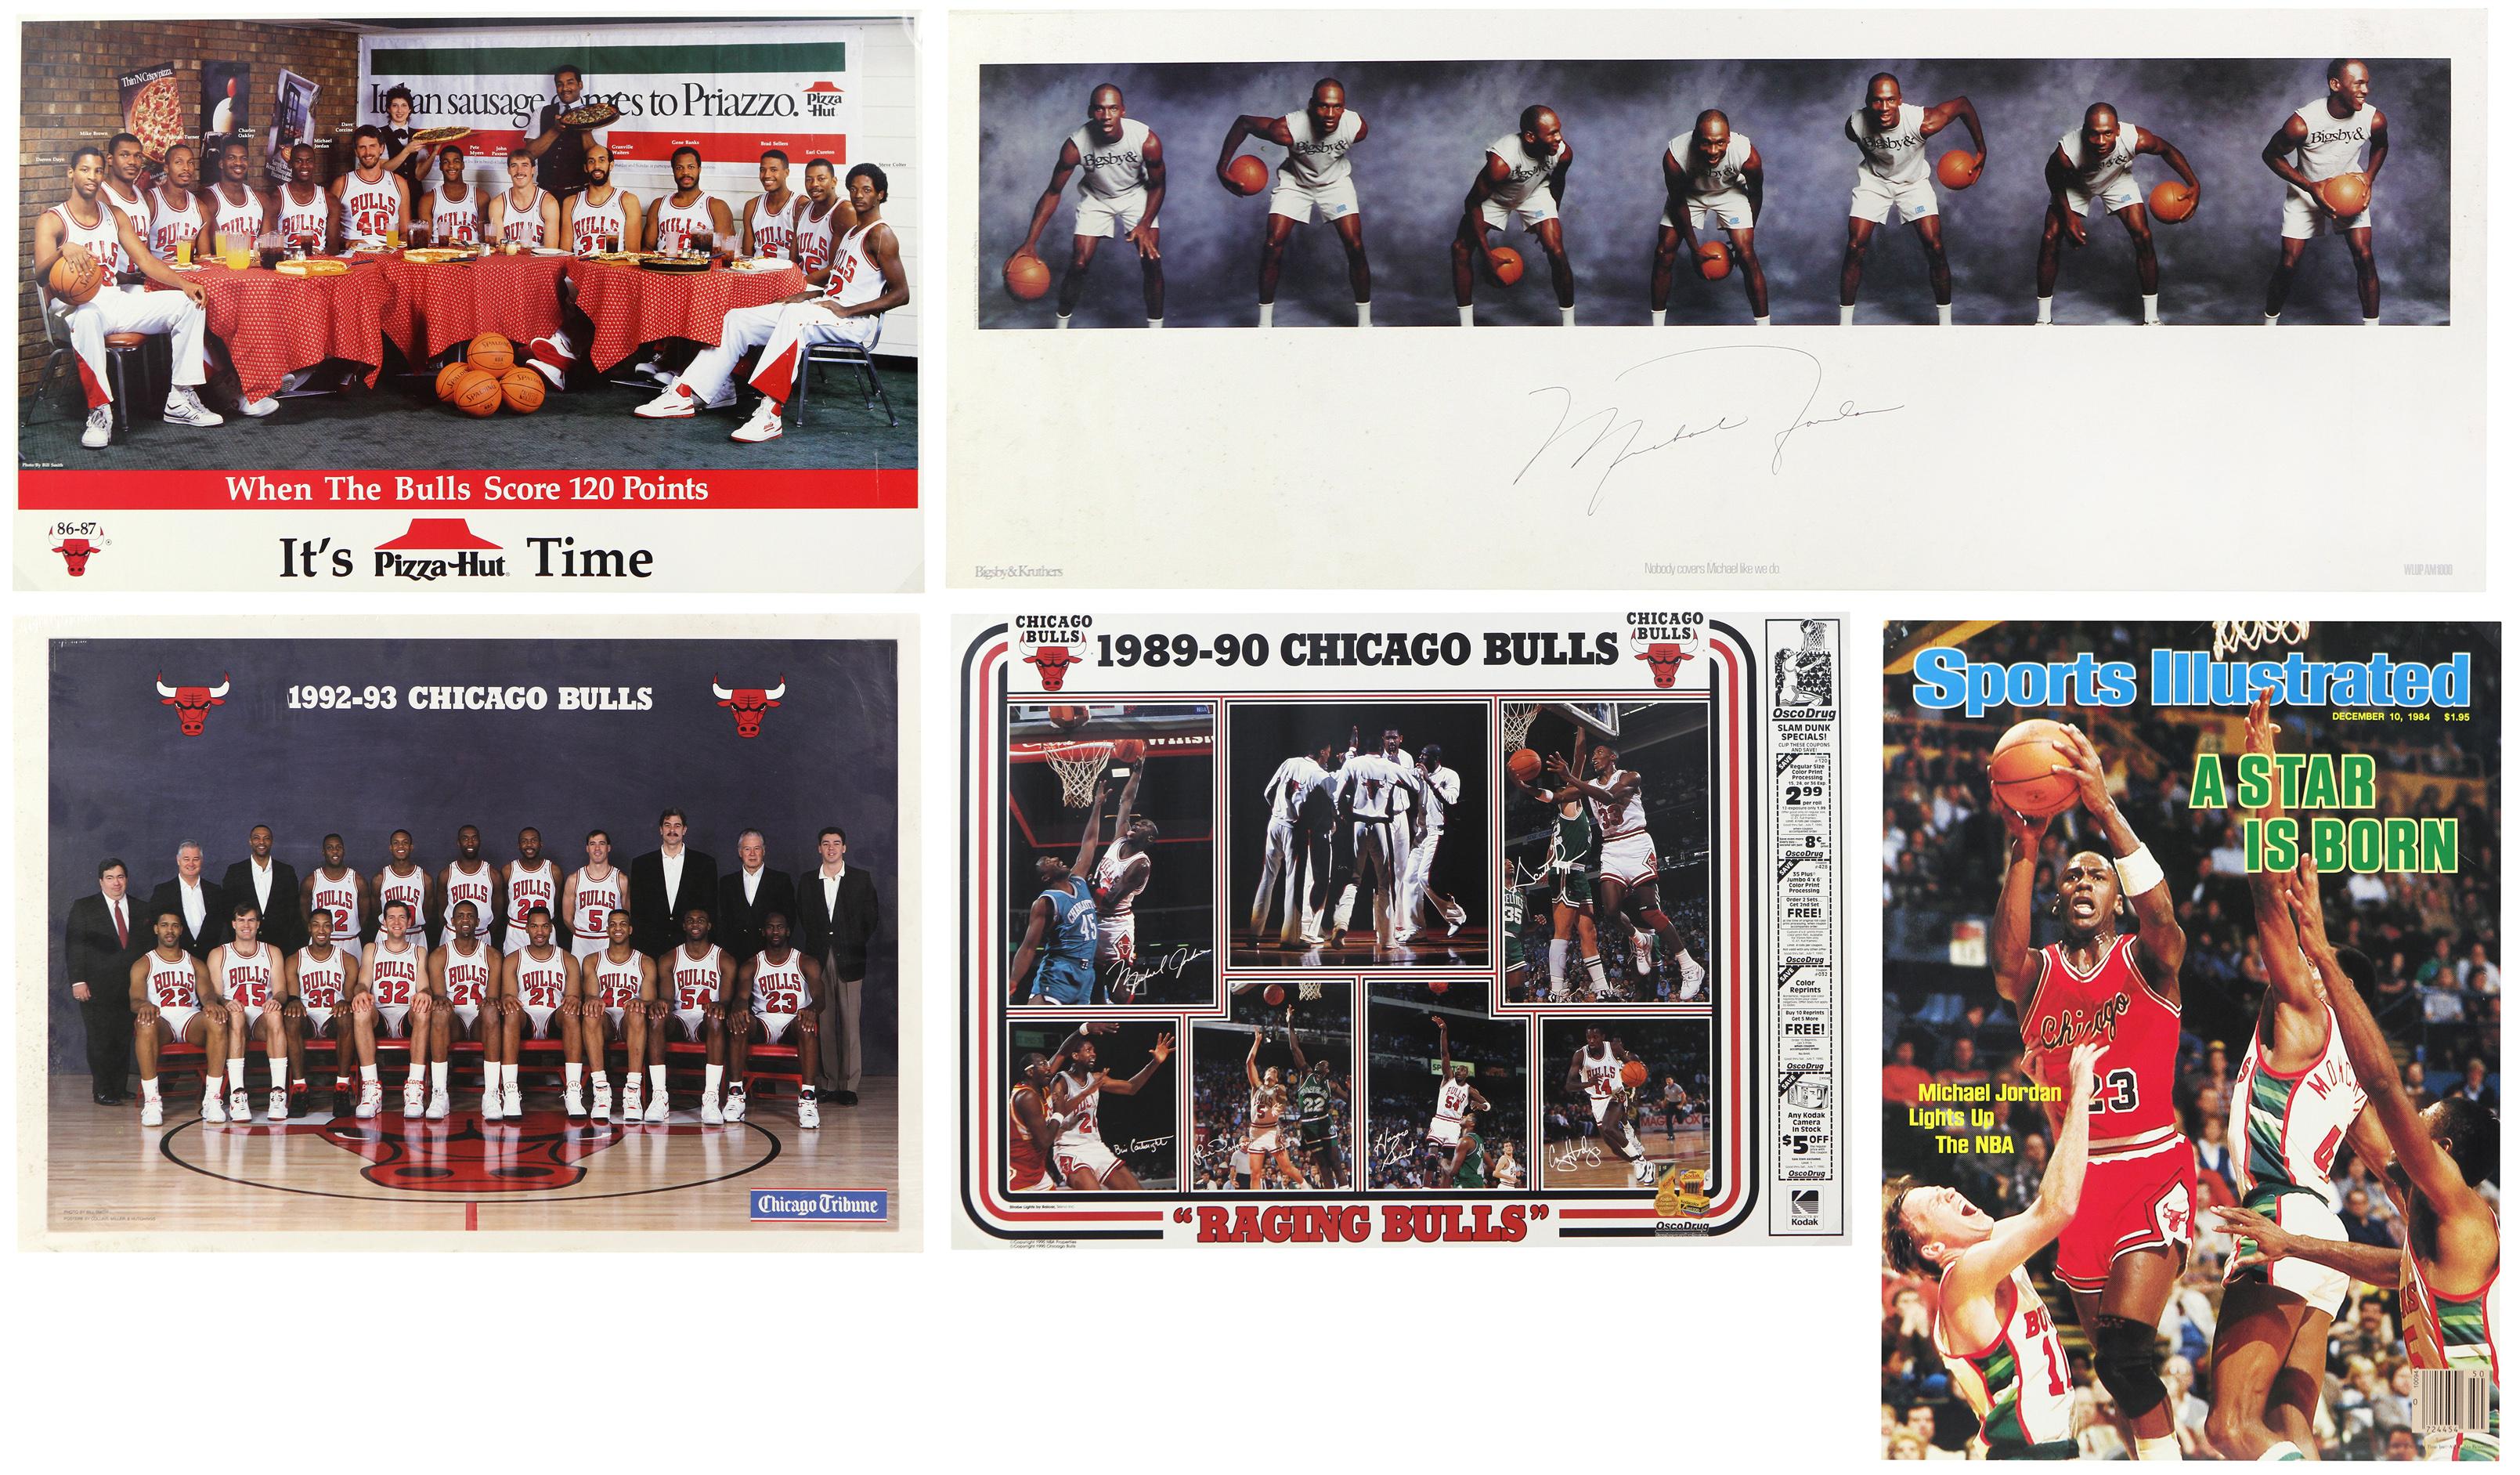 a8cee08fb05 Lot Detail - 1980 s-90 s Michael Jordan Chicago Bulls Poster ...